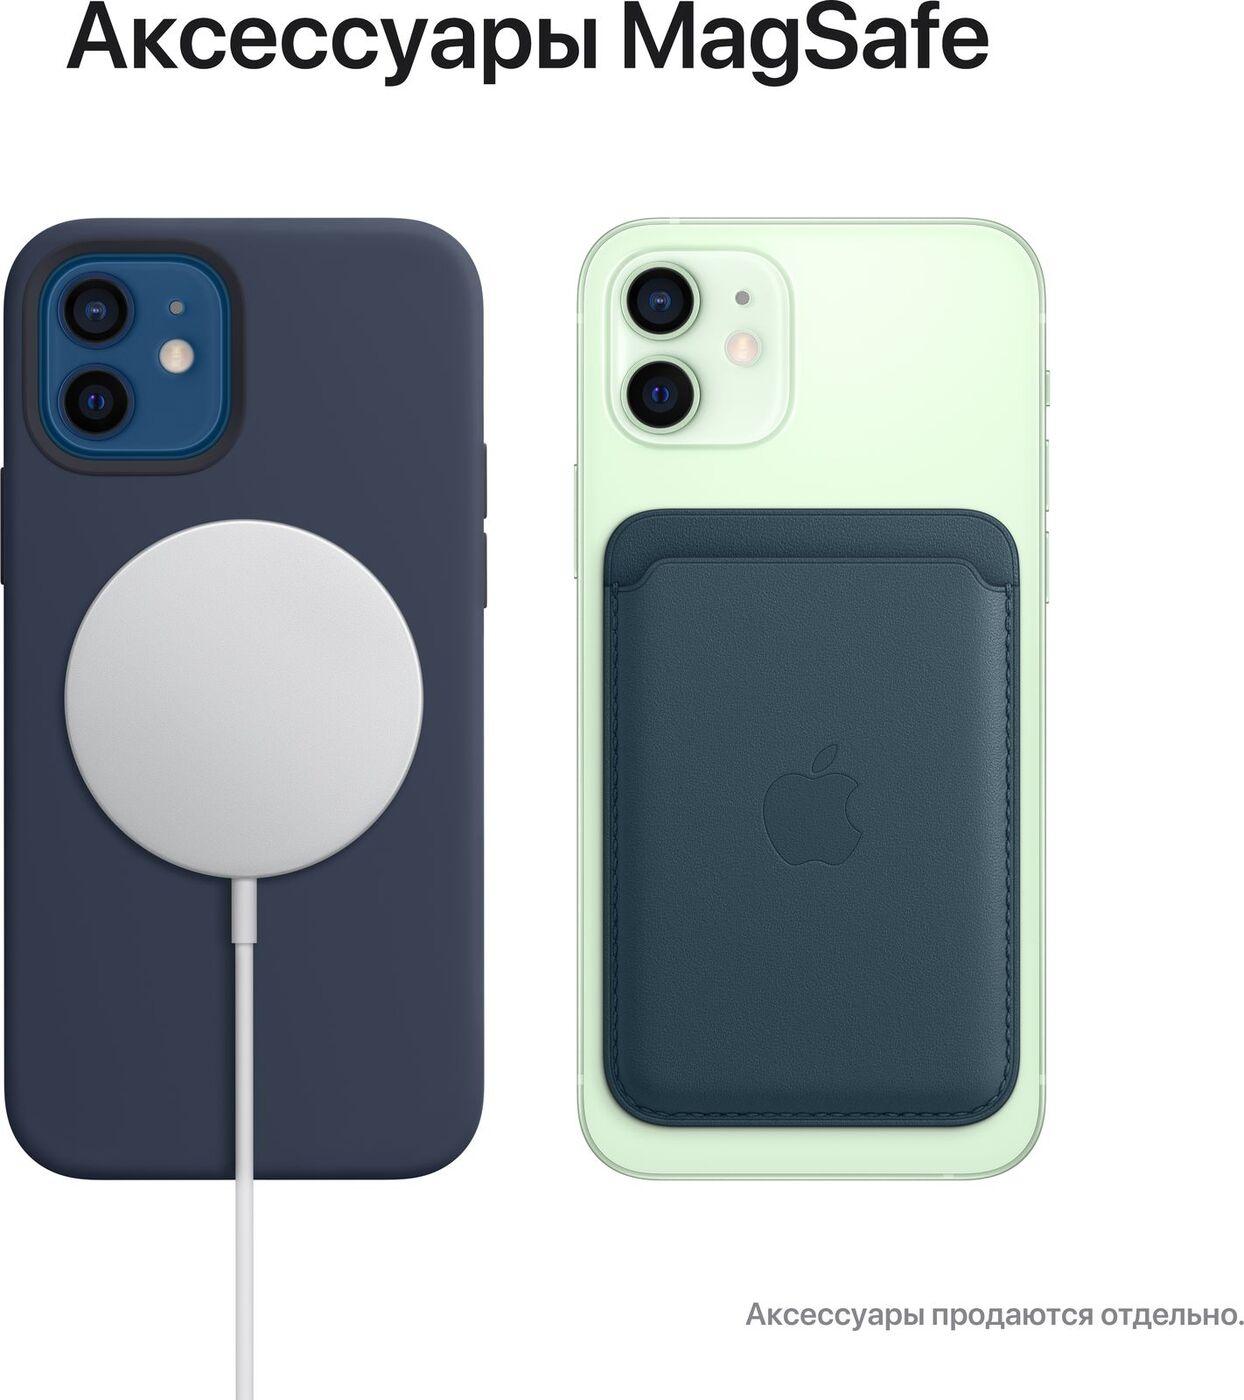 смартфон apple iphone 12 mini 128gb, зелёный. уцененный товар